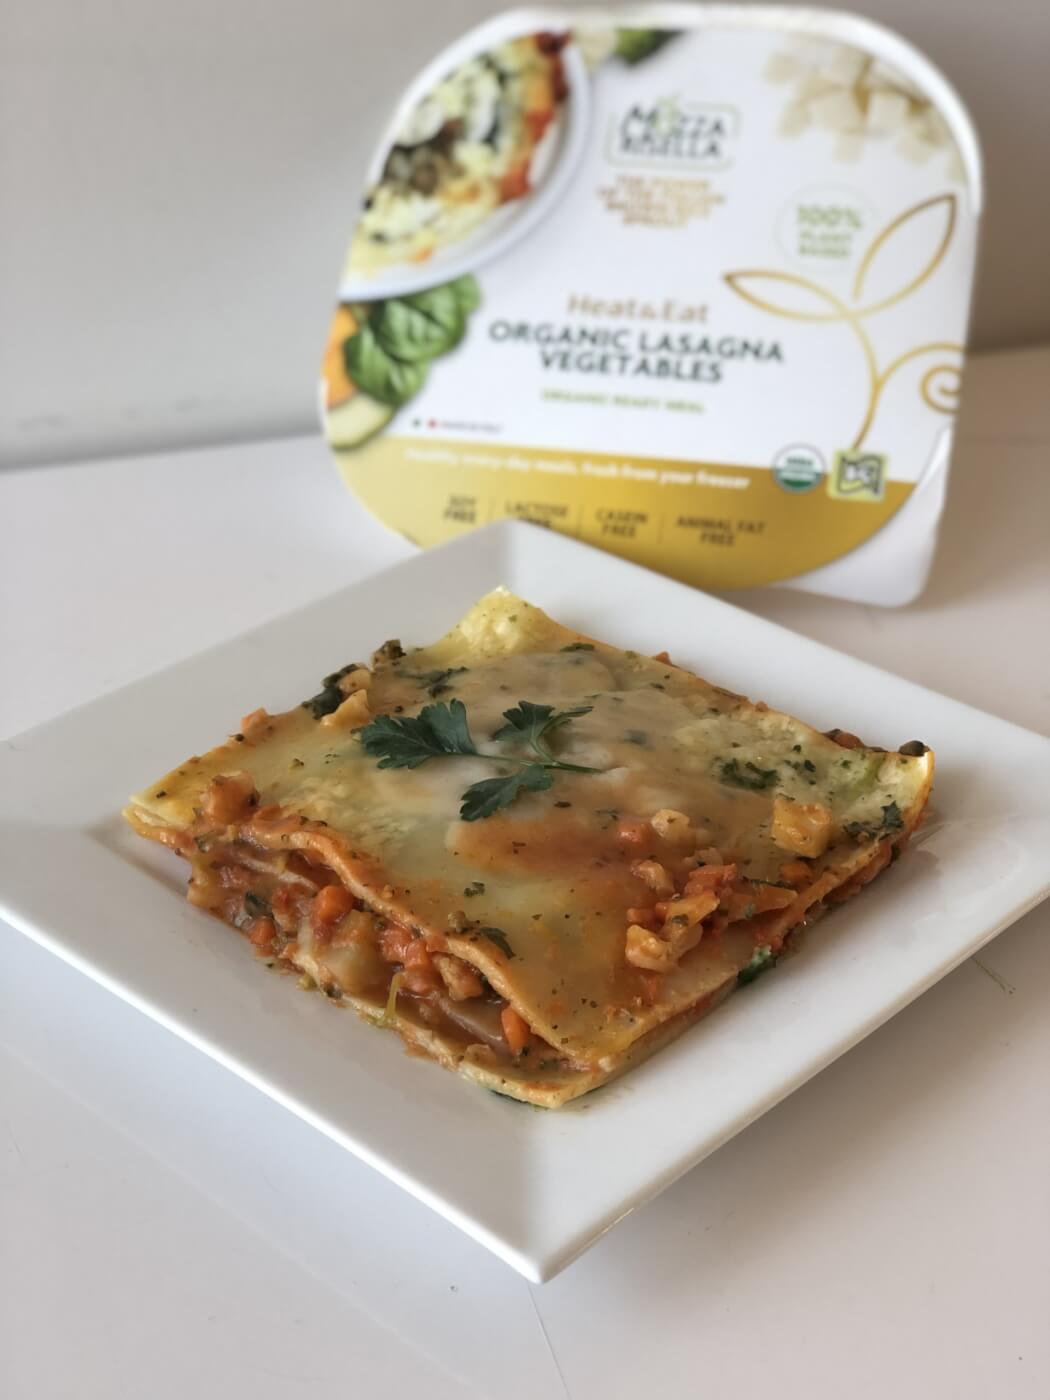 new vegan products